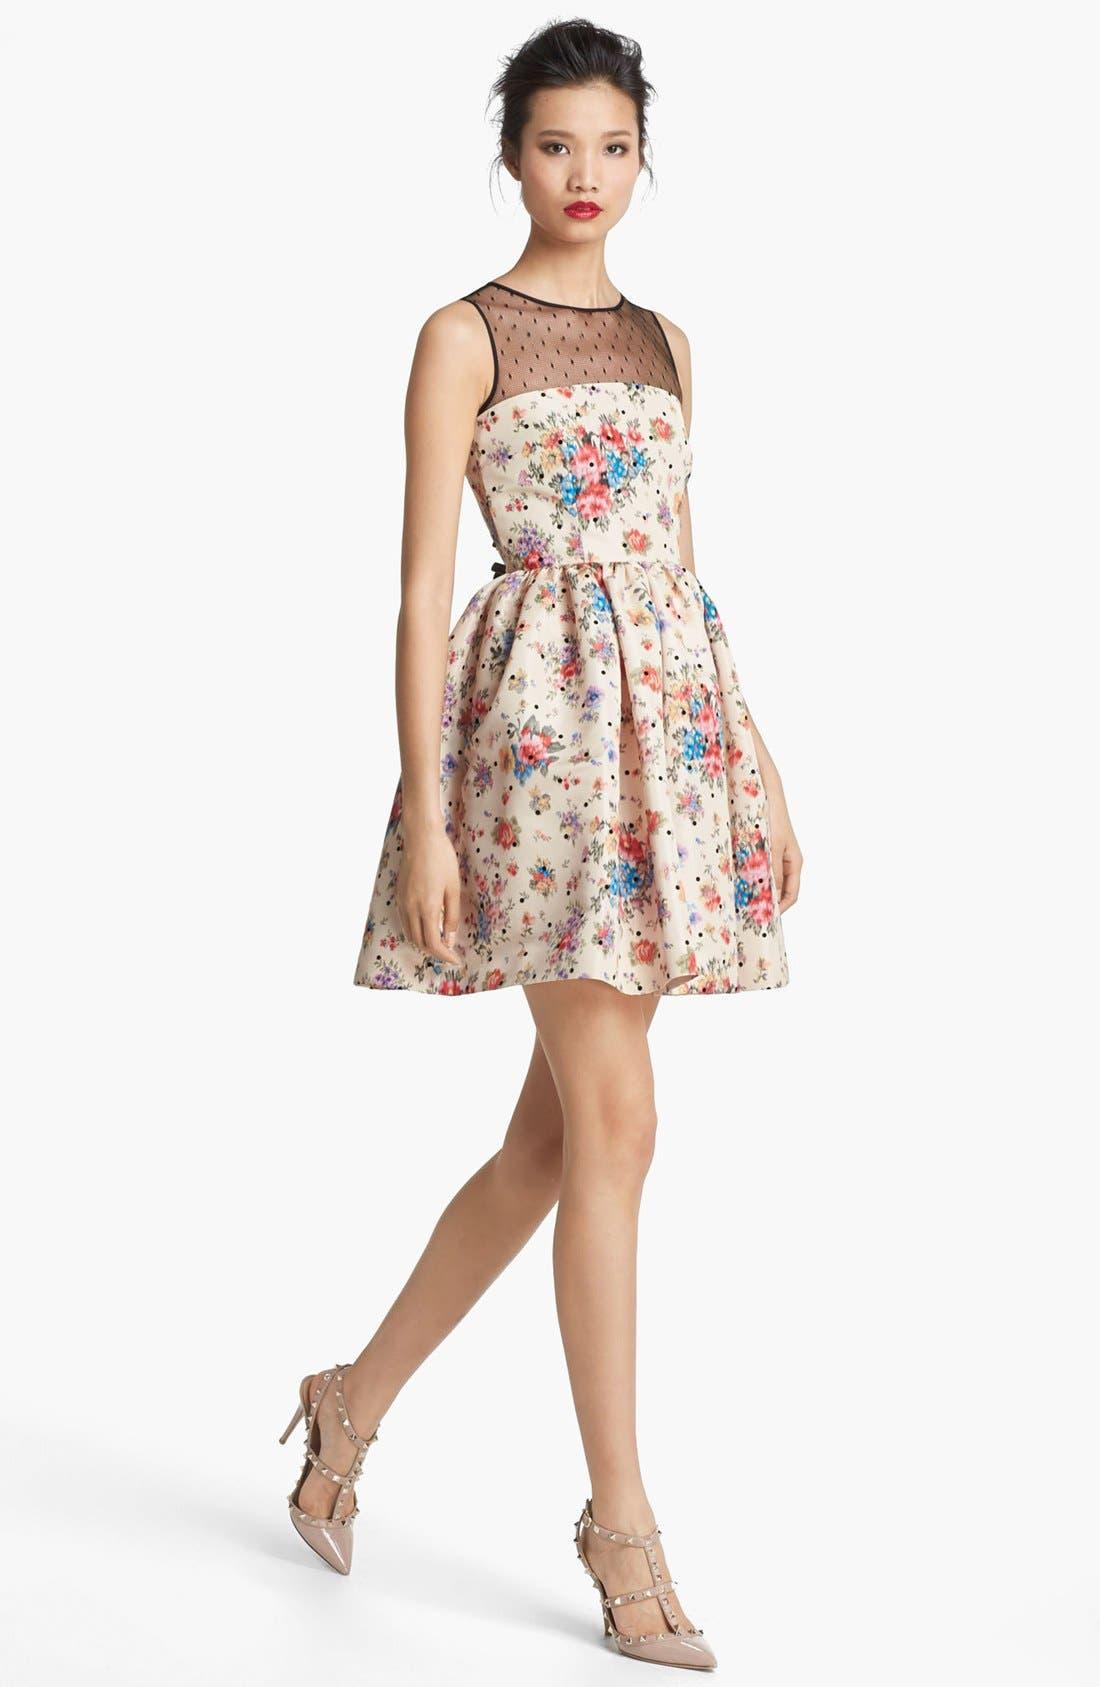 Main Image - RED Valentino Dress & Accessories